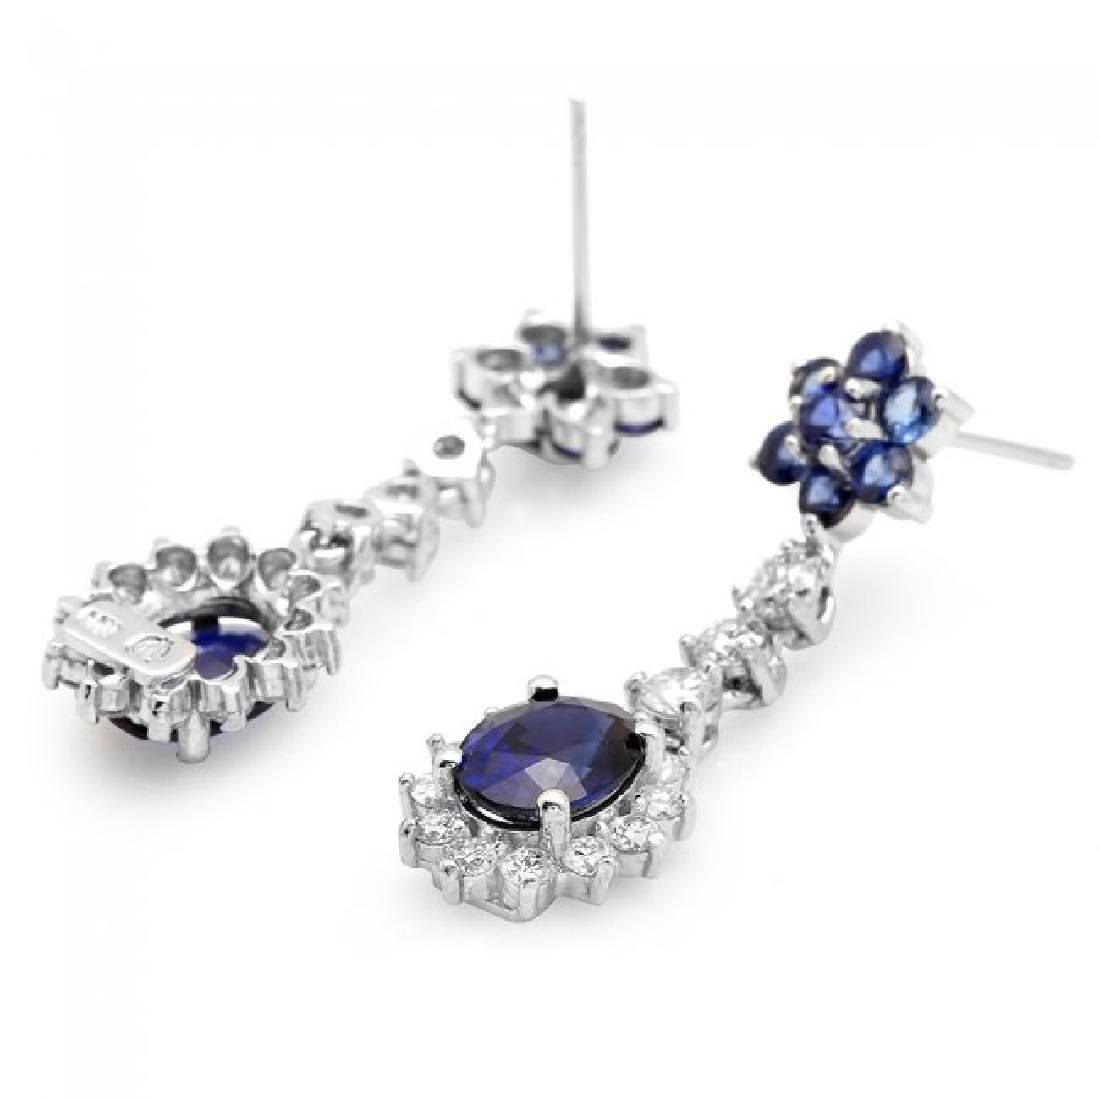 14k Gold 4.5ct Sapphire 1.40ct Diamond Earrings - 2